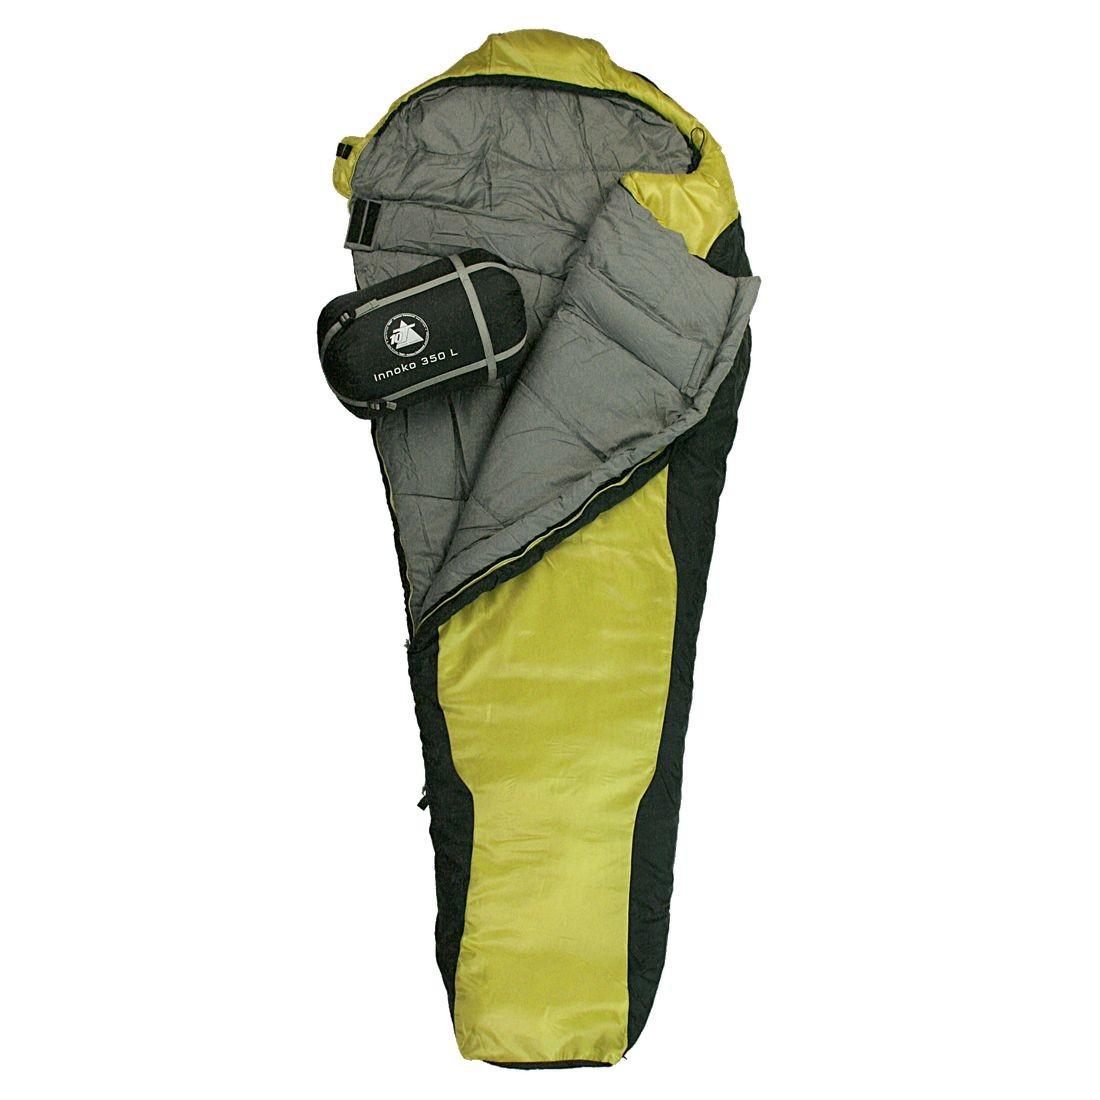 best service a7a5c 5848d 10T Innoko 350L - Single mummy sleeping bag, 215x85/55 cm, black/yellow  winter sleeping bag, up to -21°C Sleeping Sleeping bags Mummy sleeping bag